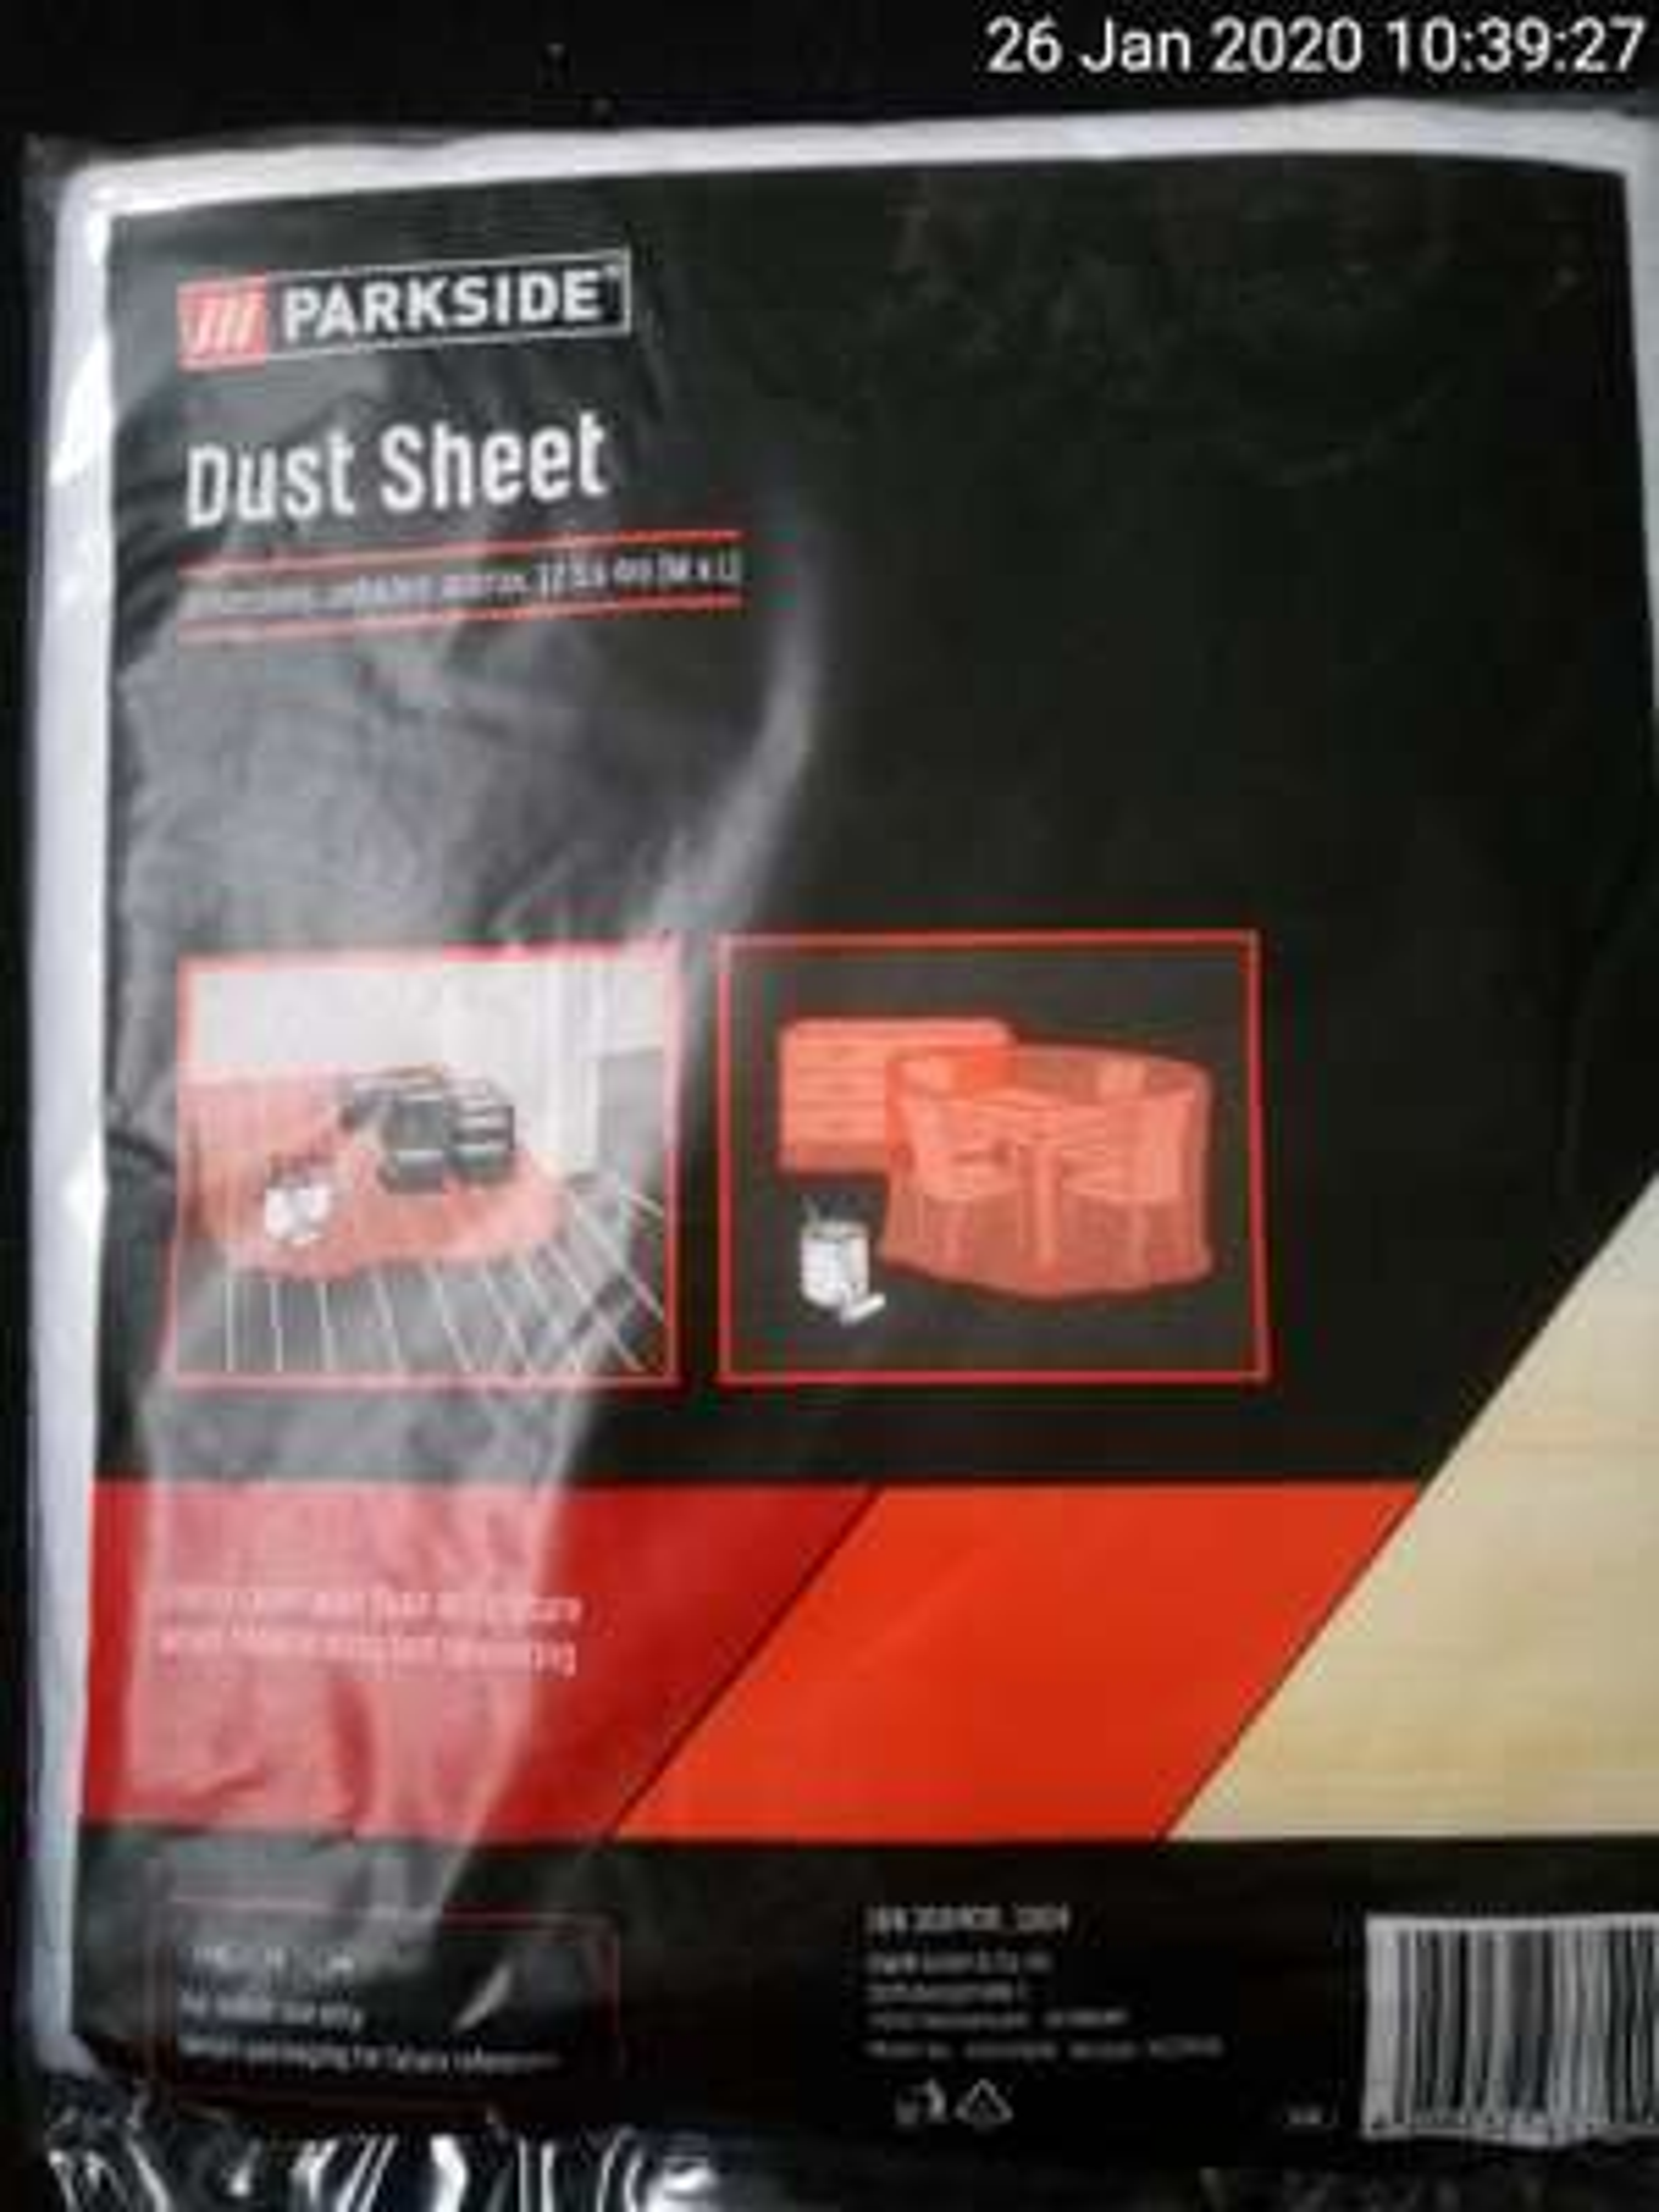 Lidl 'parkside' 12.5m x 4m dust sheet £1.99 at Lidl Dewsbury, West Yorkshire